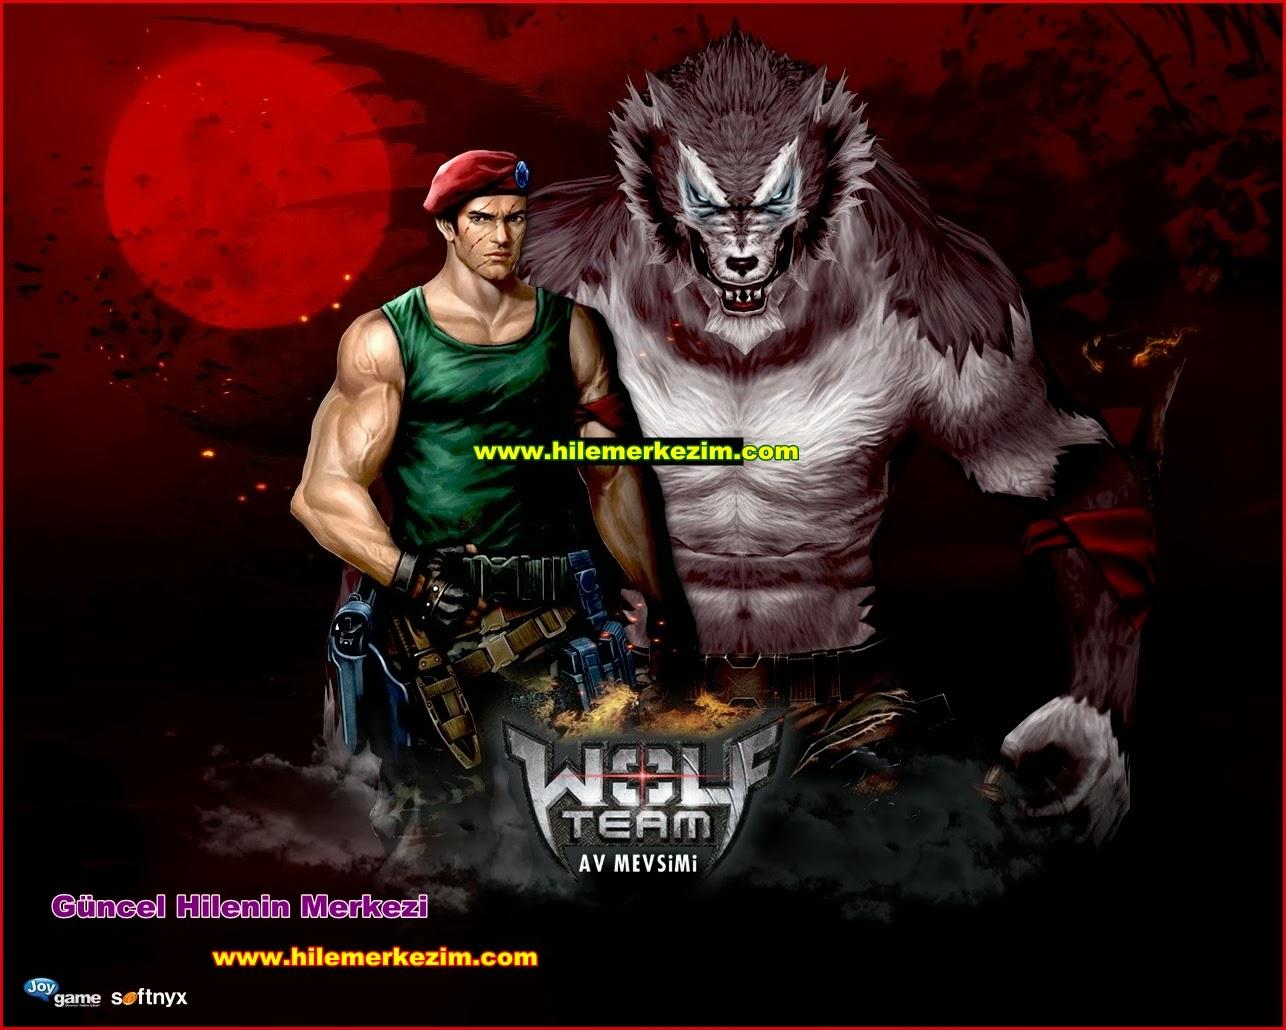 Wolfteam TR Calisan Sniper Hedef Nisangah Hilesi İndir 27.03.2014